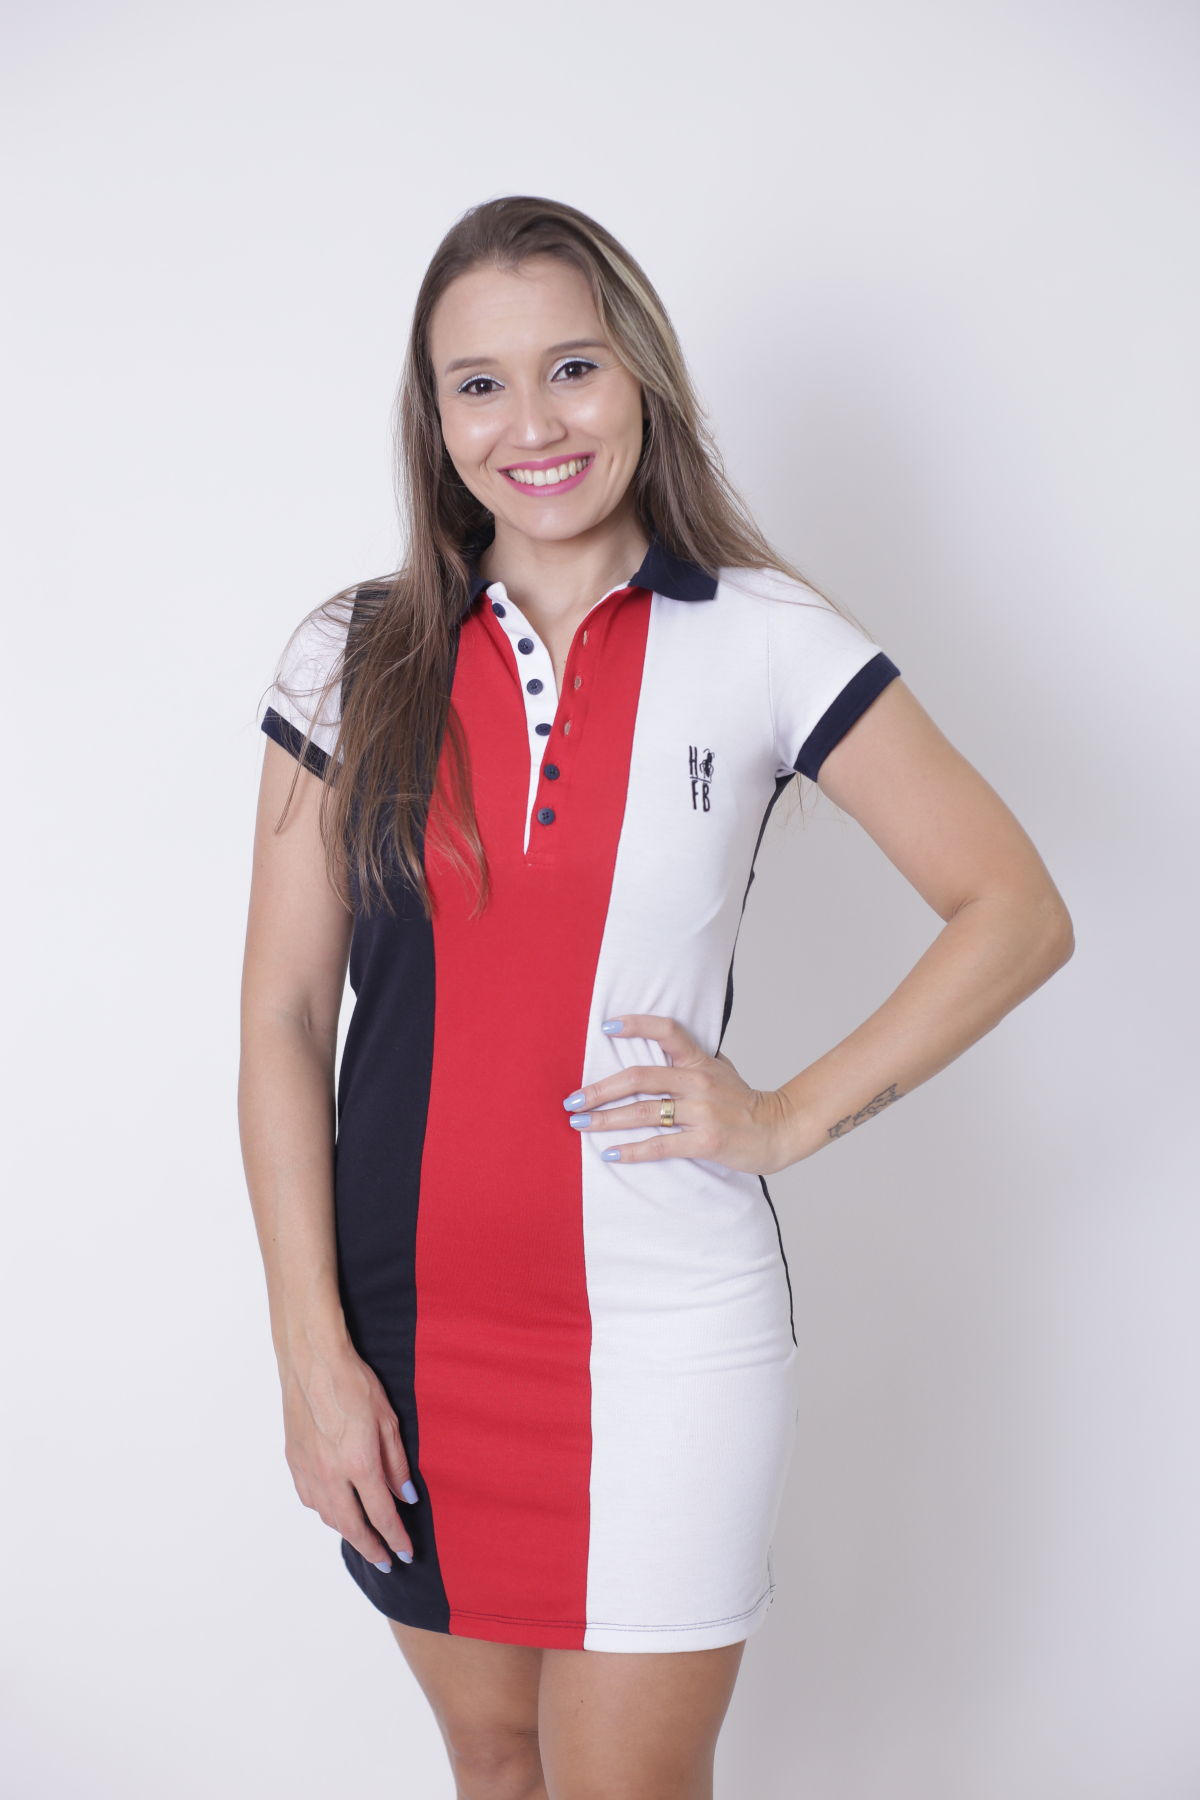 MÃE E FILHOS > Kit 02 peças Vestido + Body Unissex Polo - Listrados King [Coleção Tal Mãe Tal Filhos]  - Heitor Fashion Brazil